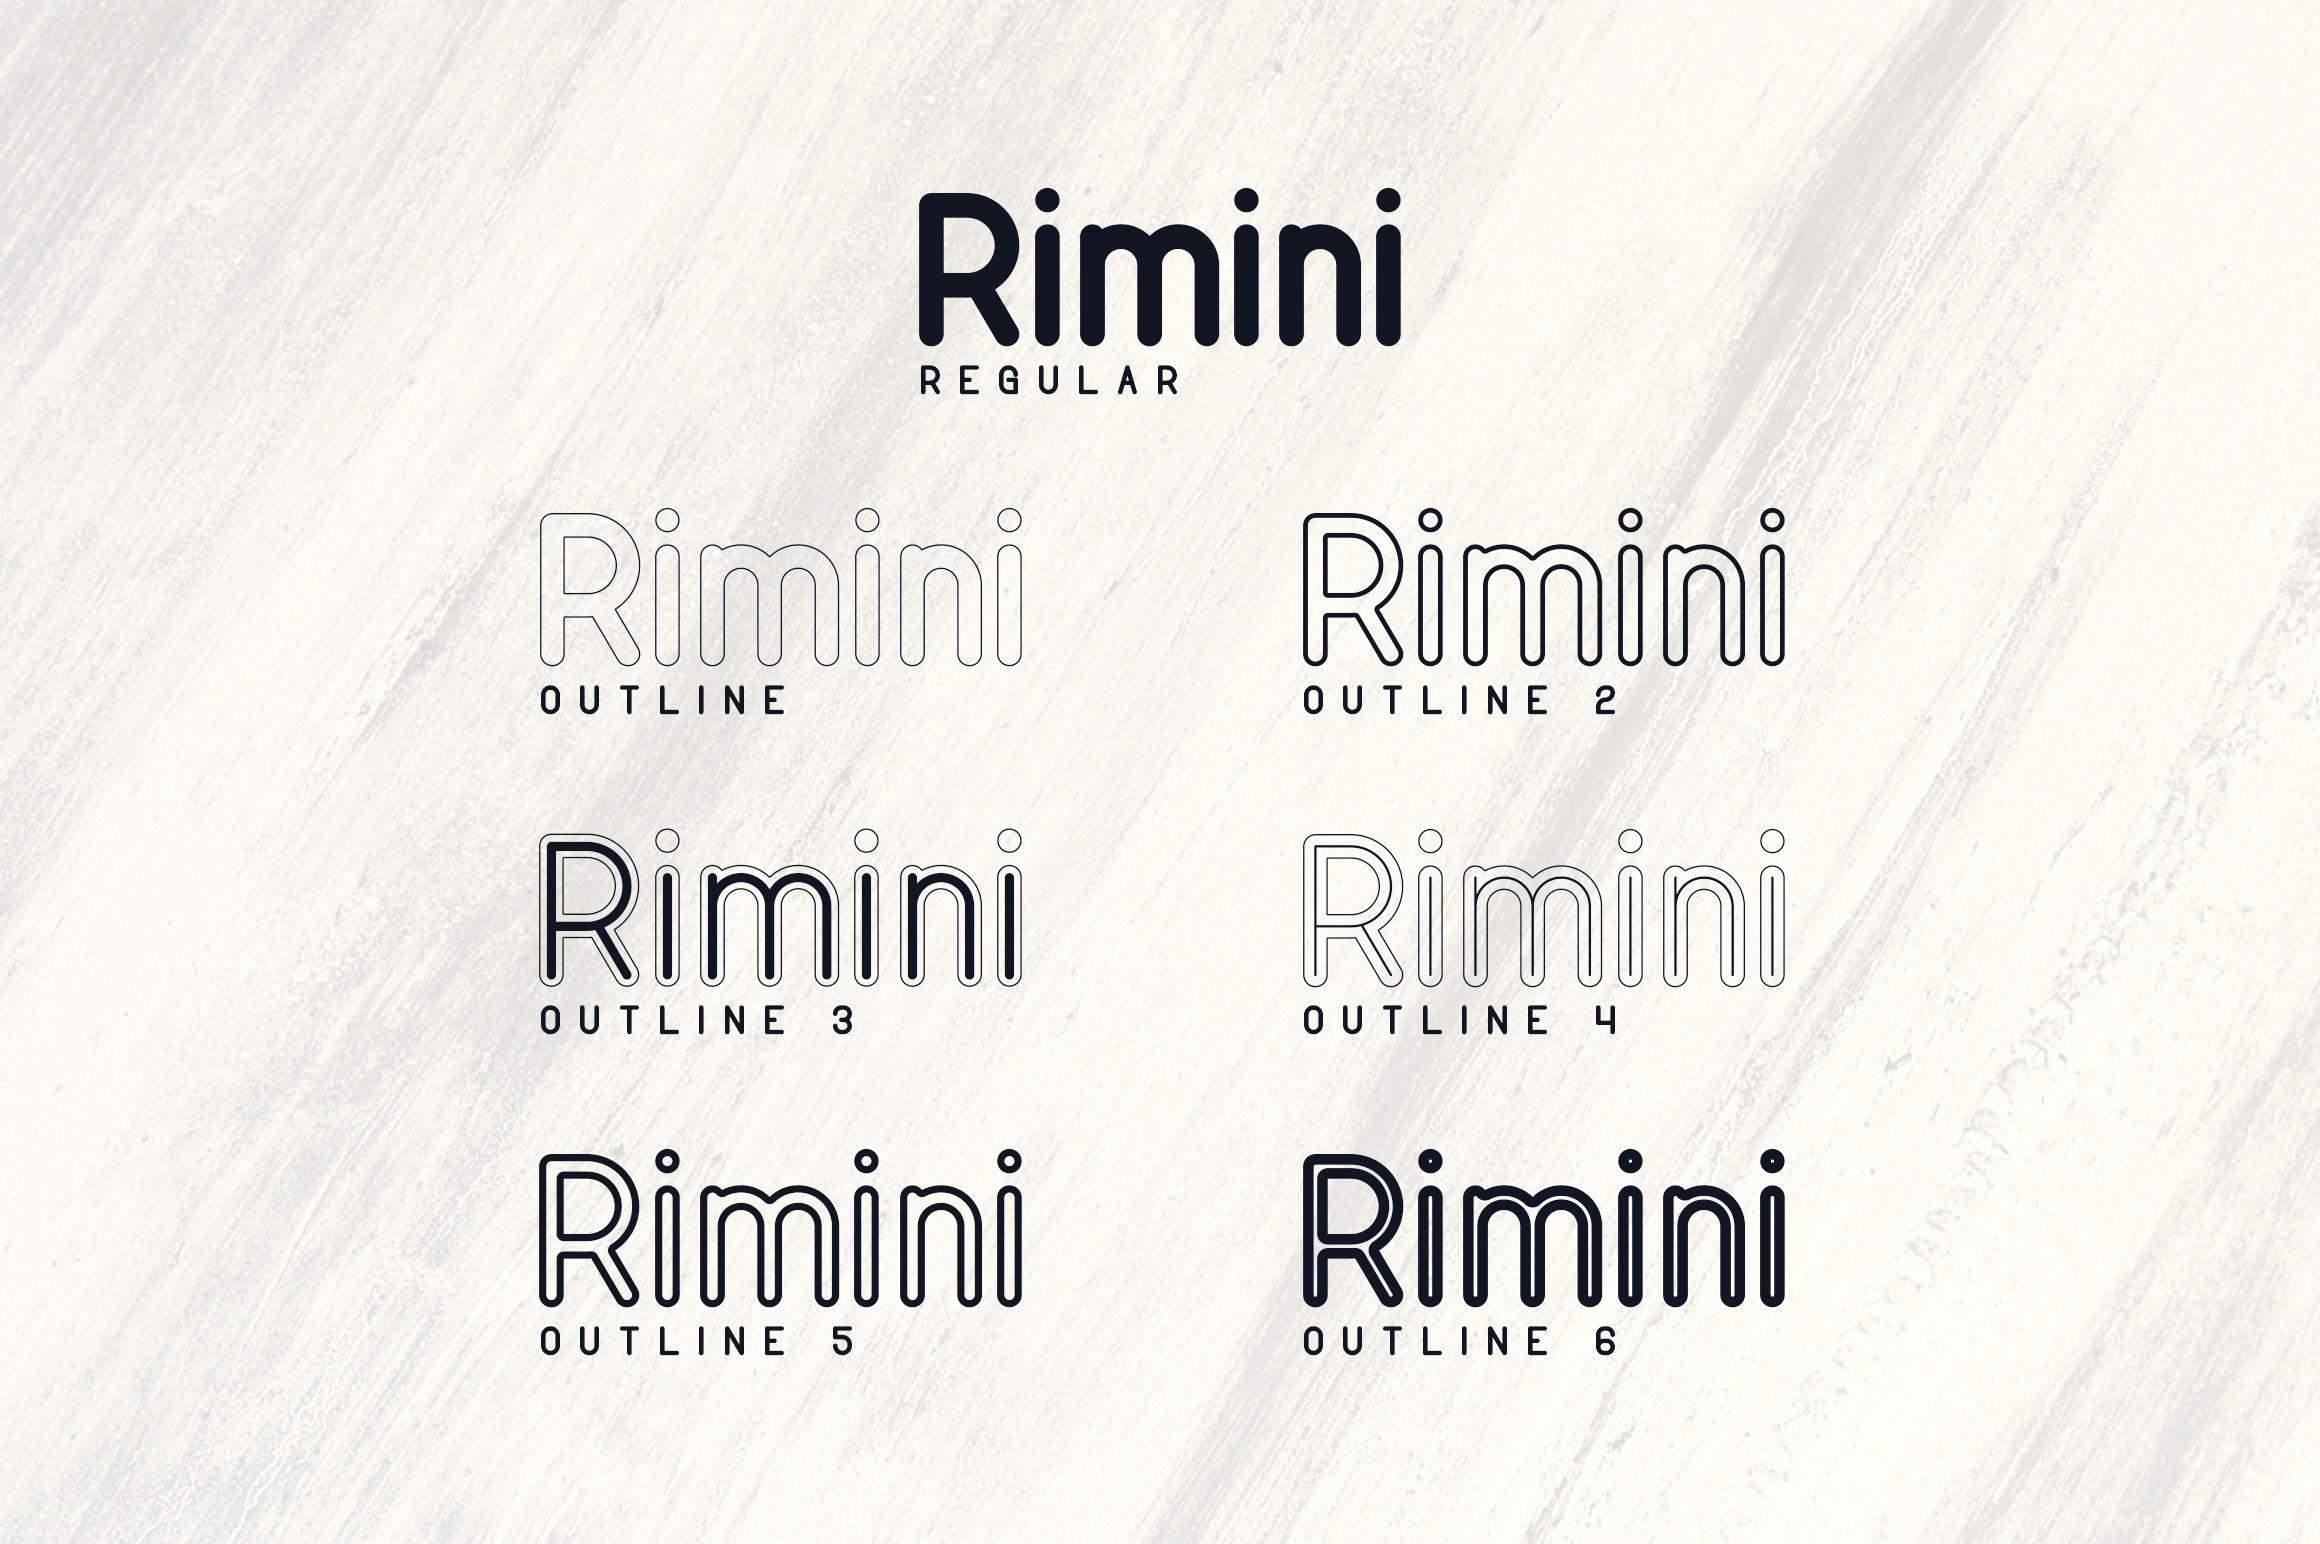 Rimini-Rounded Sans Serif font example image 2